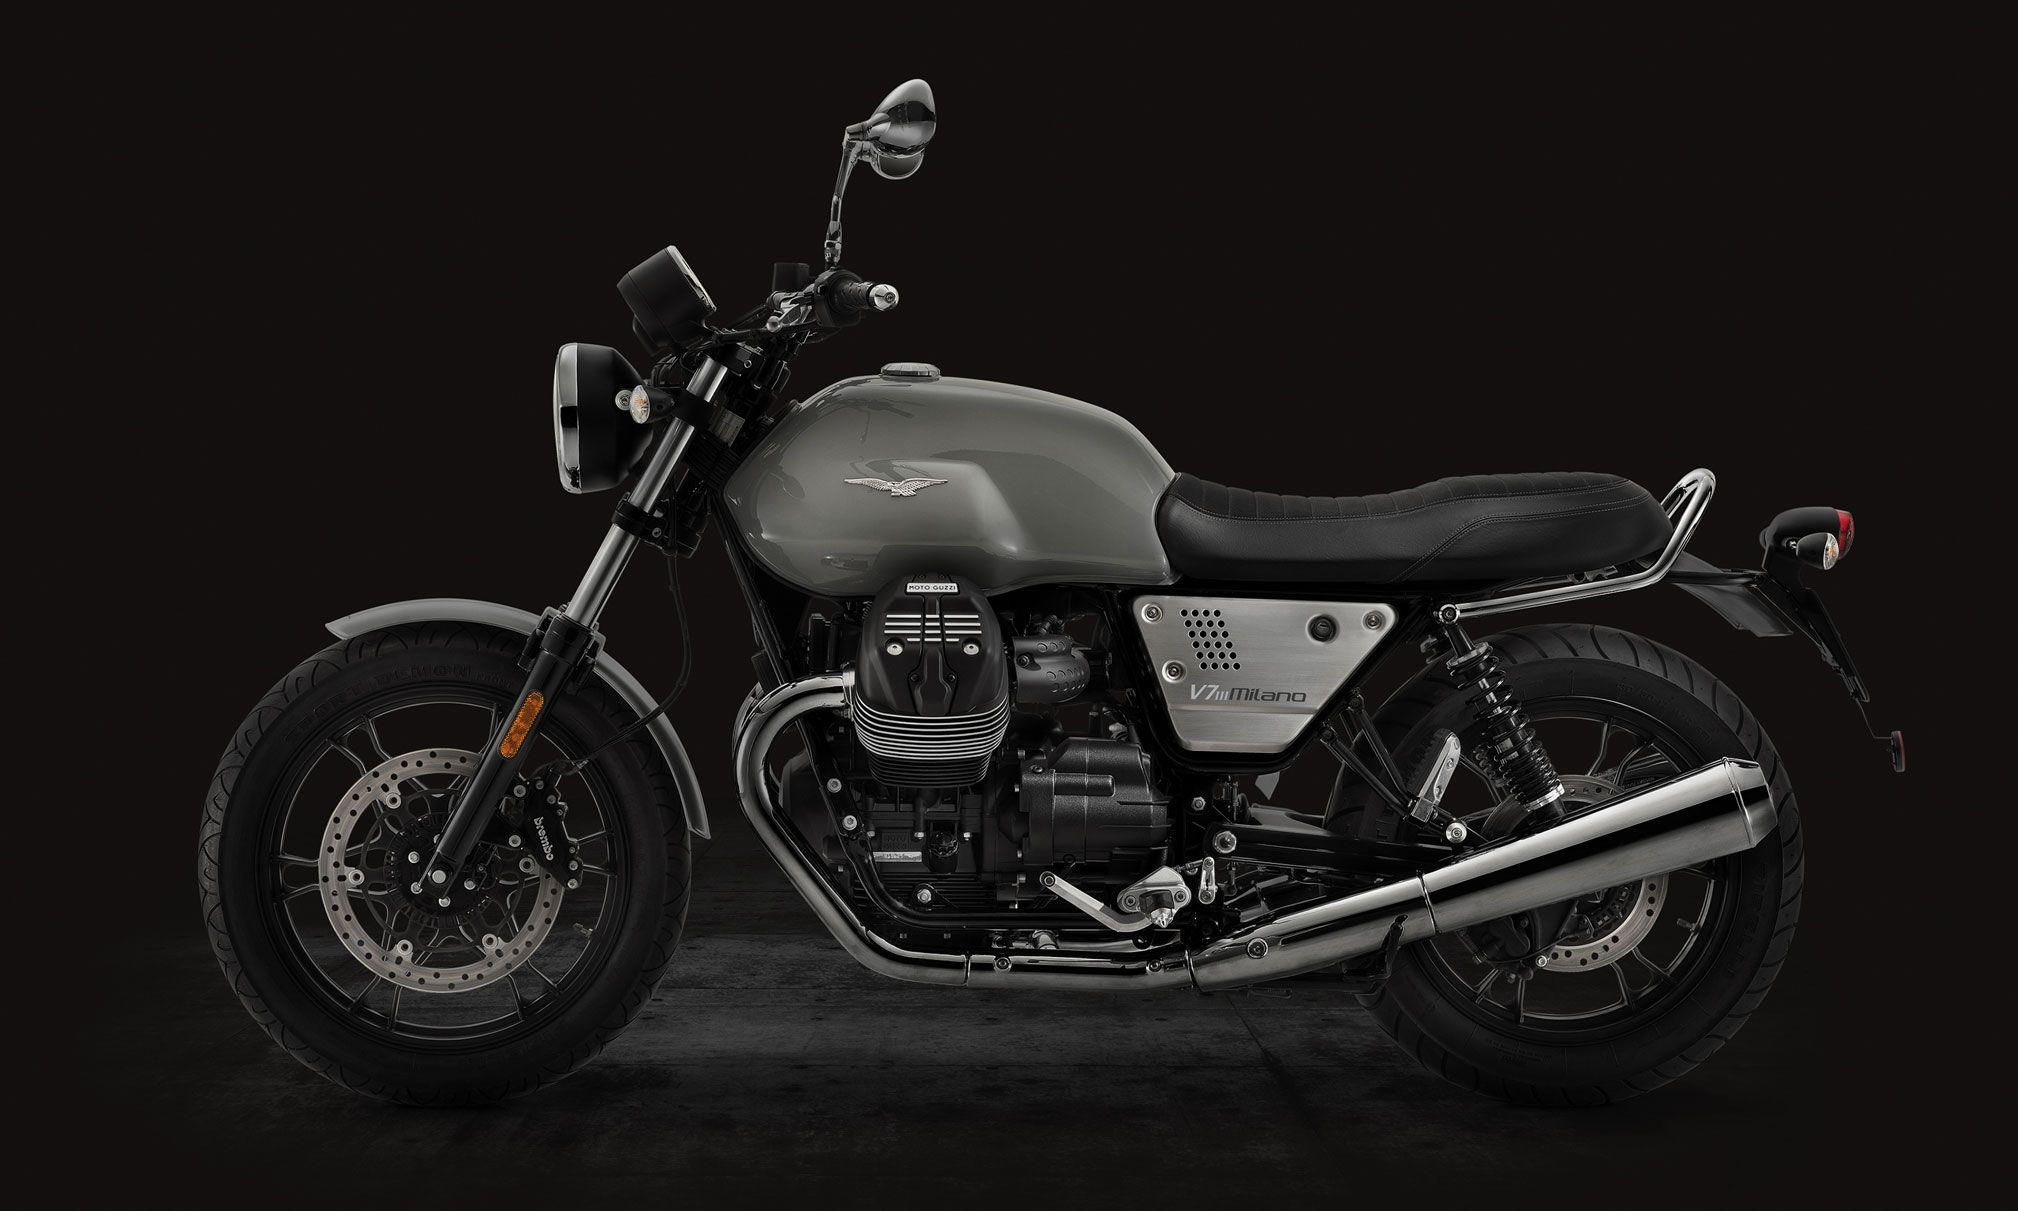 2018 Moto Guzzi V7iii Rough Review Urban Country 2018 Moto Guzzi V7iii Rough 2018motorcyclemodels Motorcycle Moto Guzzi Motorcycle Moto Guzzi Motorcycles